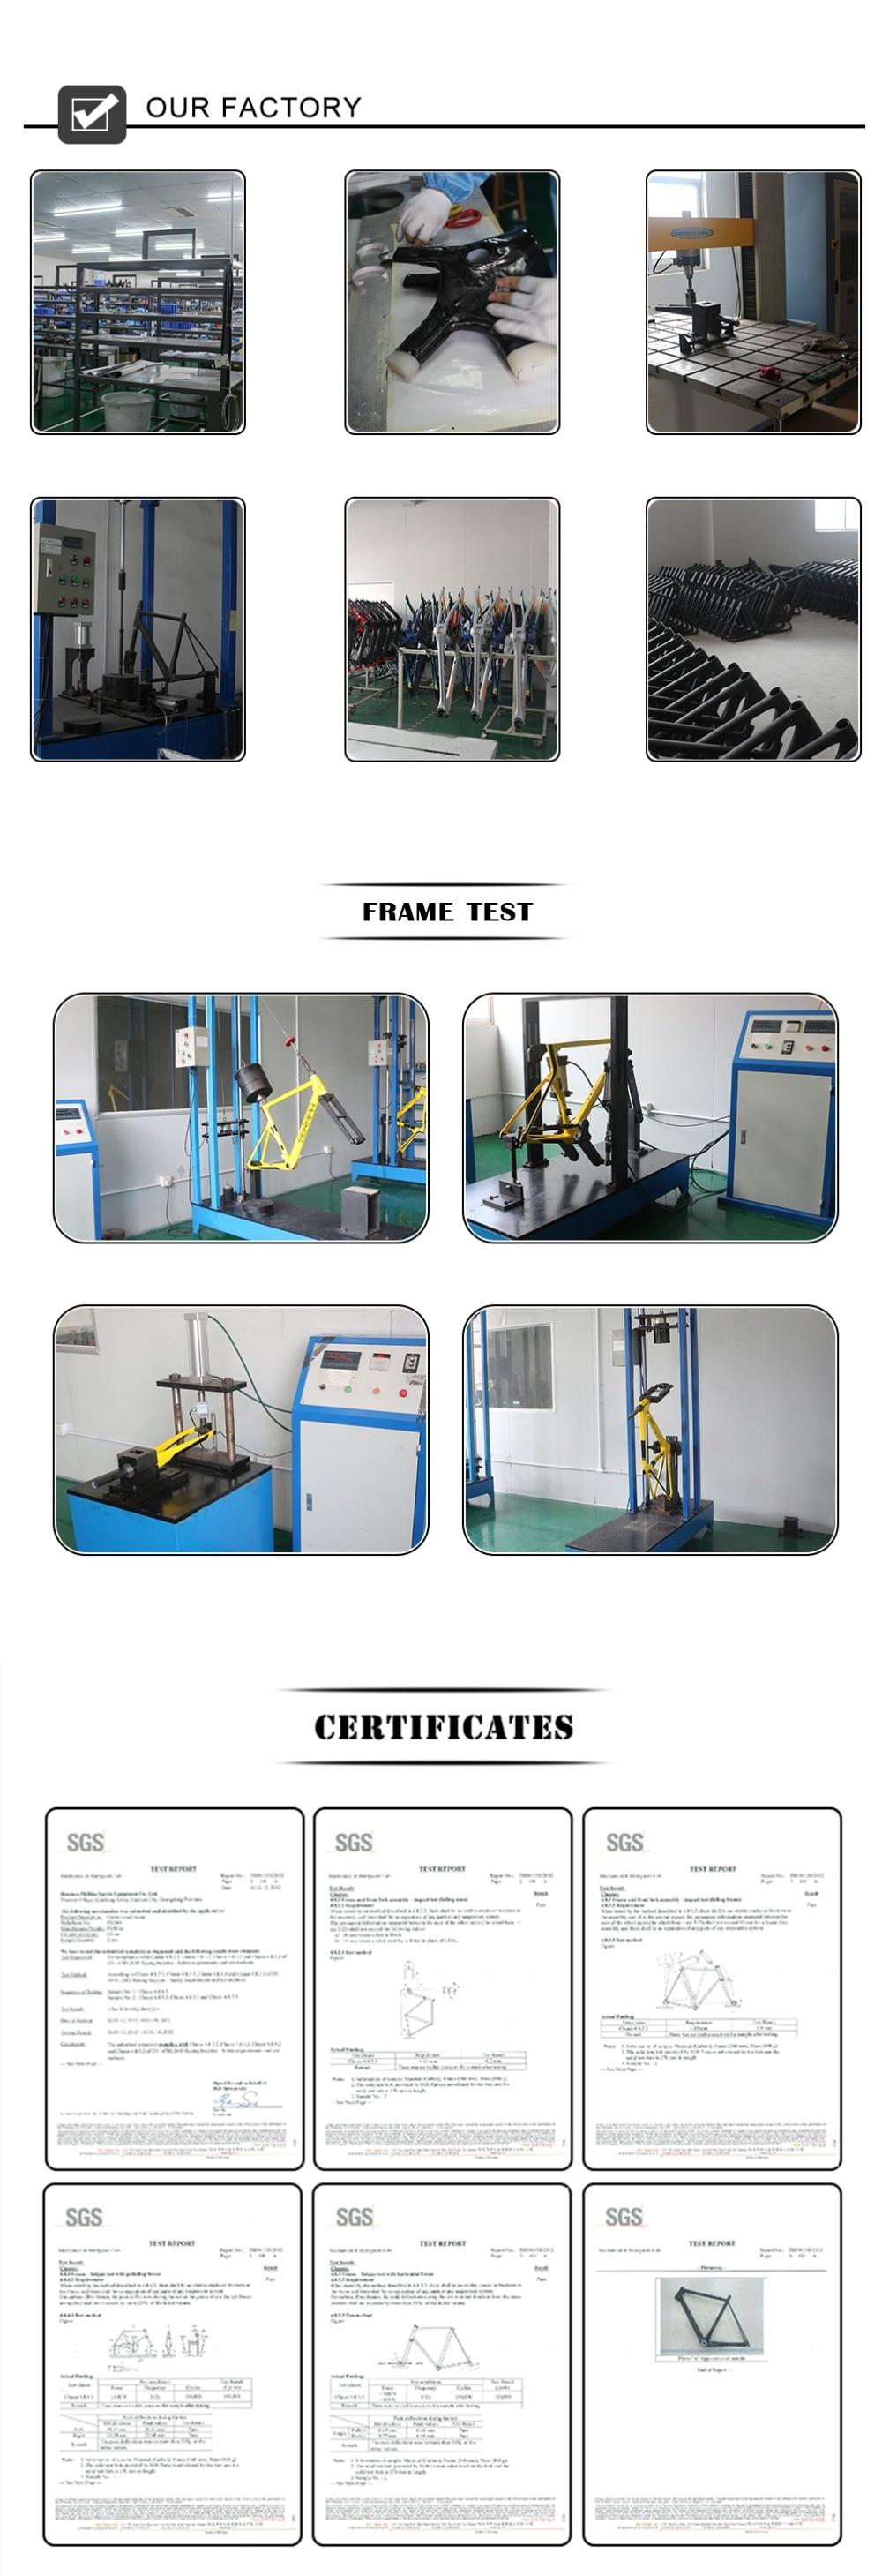 Factory&Certificates